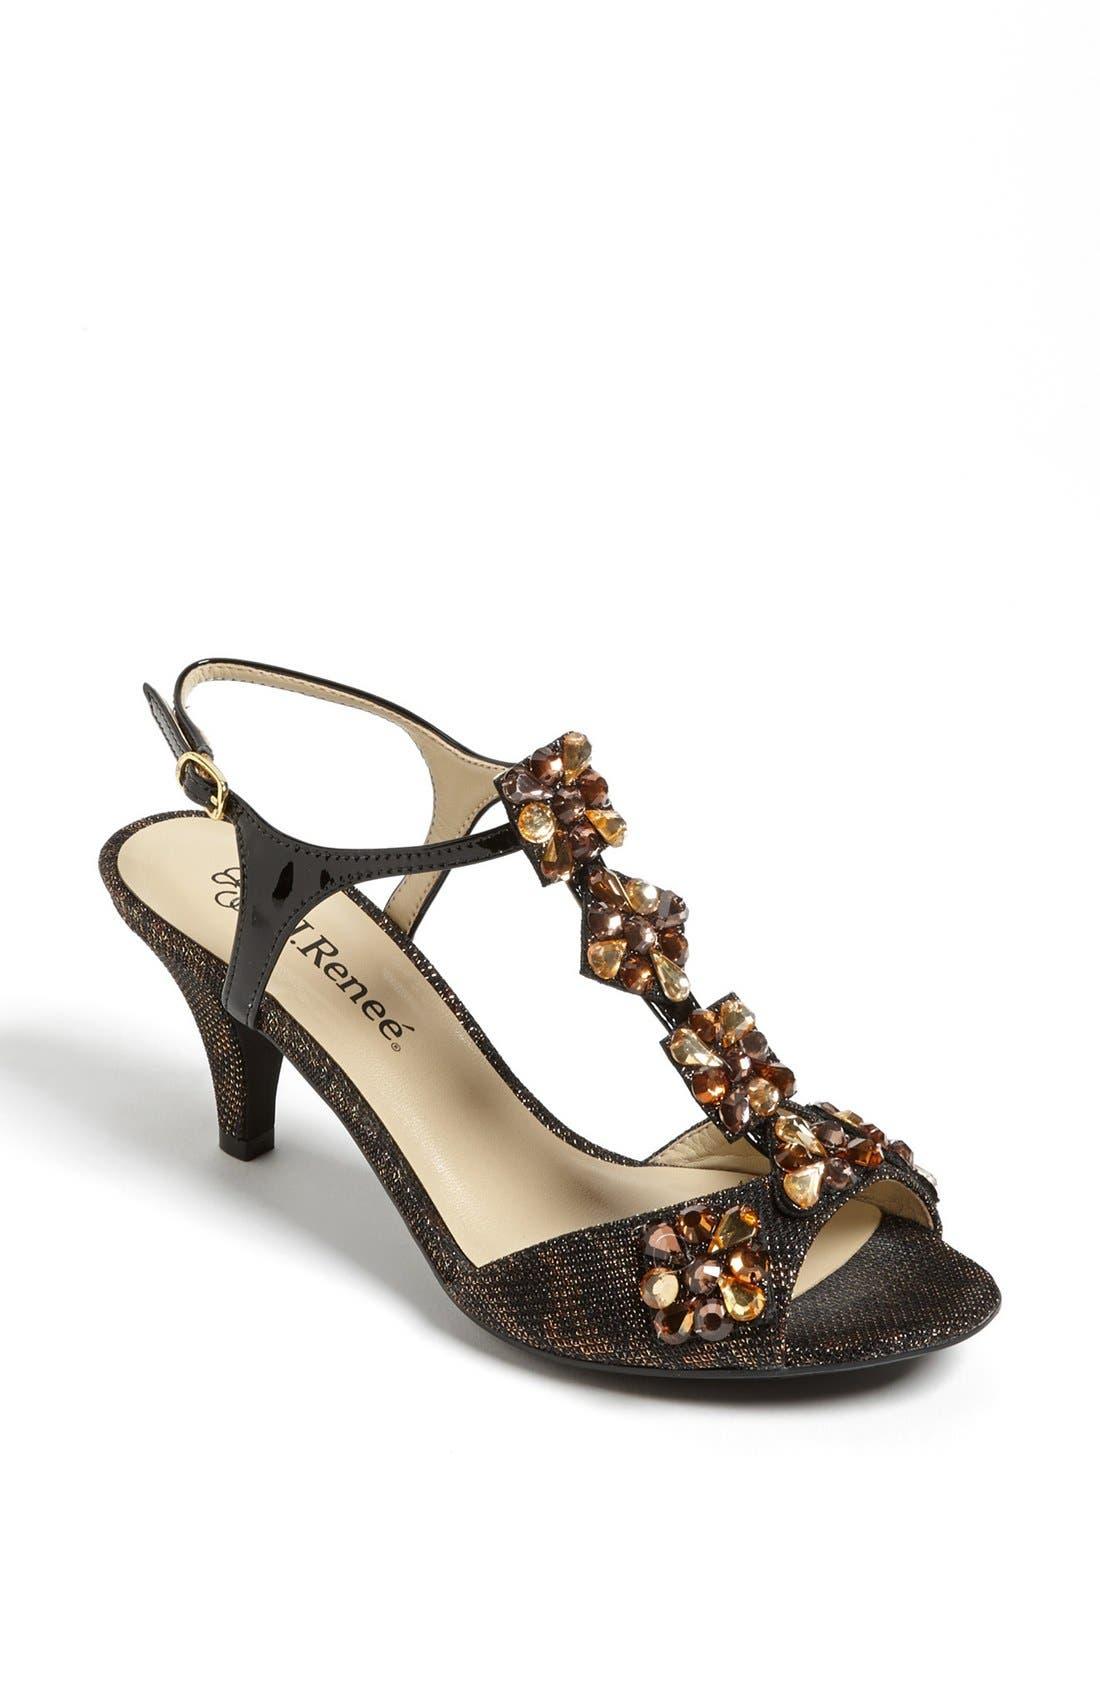 Alternate Image 1 Selected - J. Renee 'Raspy' Sandal (Online Only)